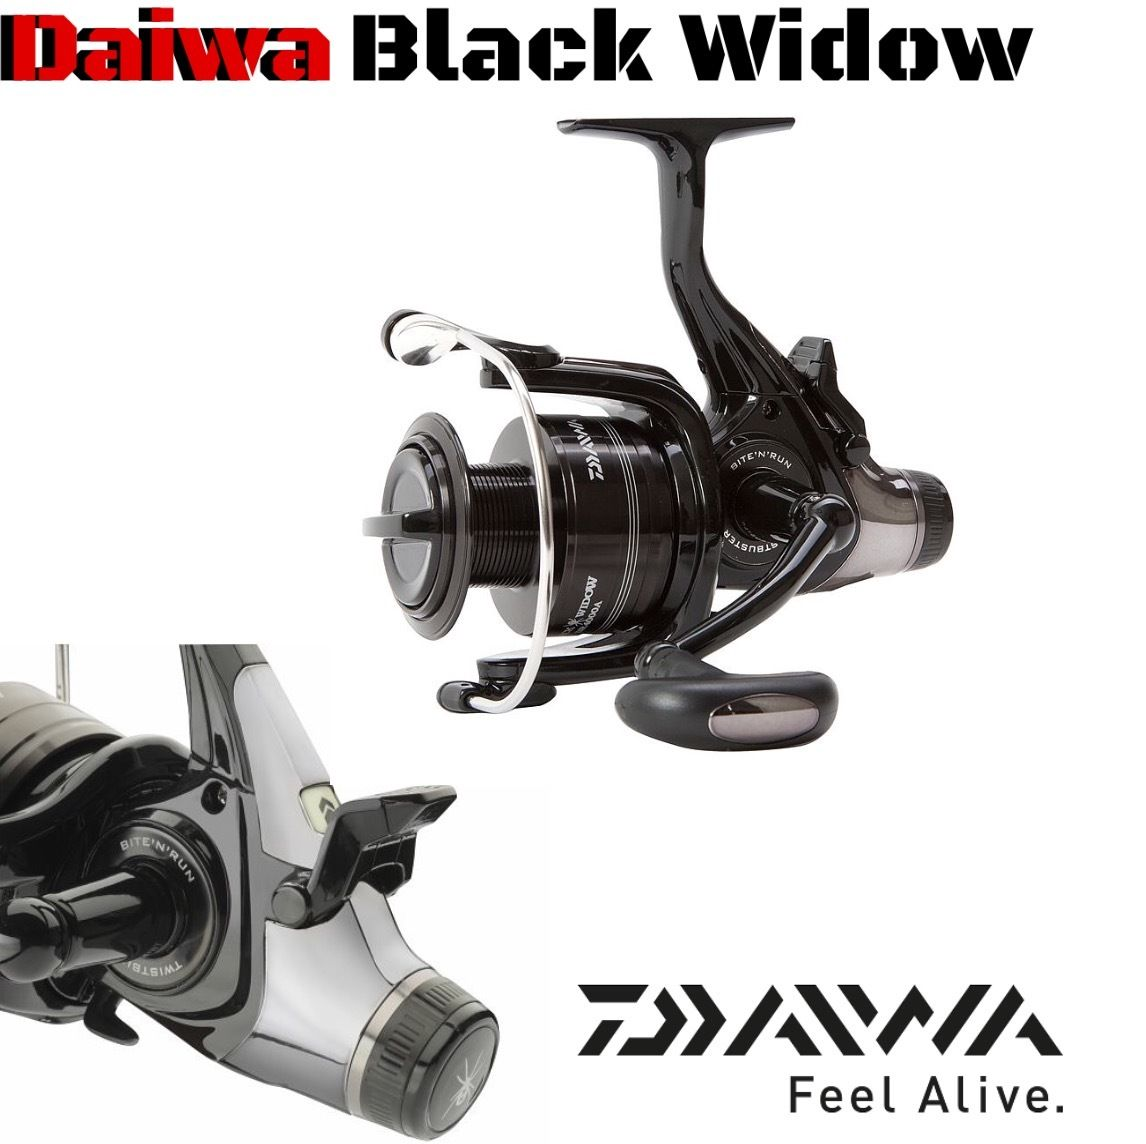 Daiwa free spool reel Black Widow BR A